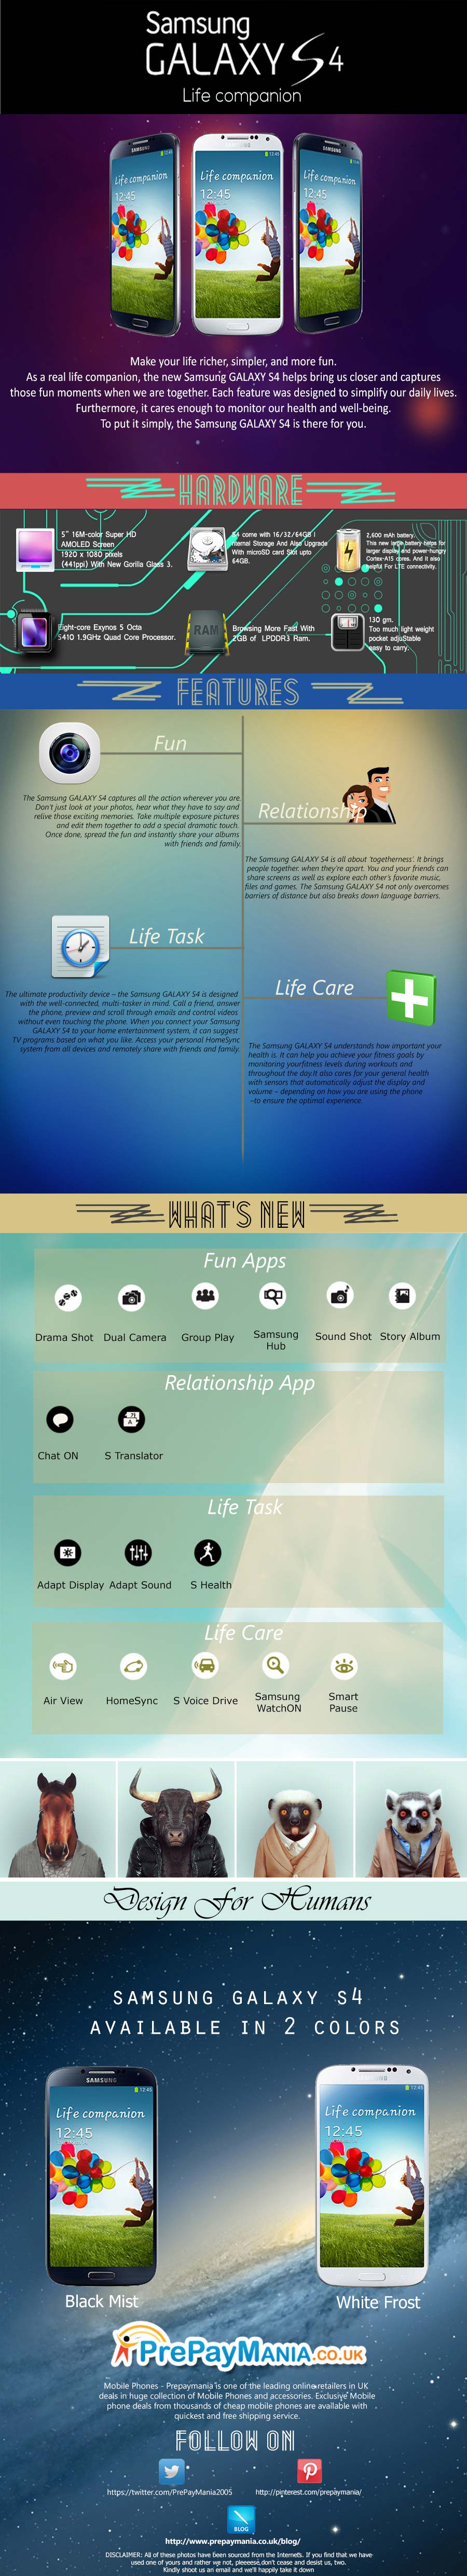 Galaxy S4 Breakdown-Infographic